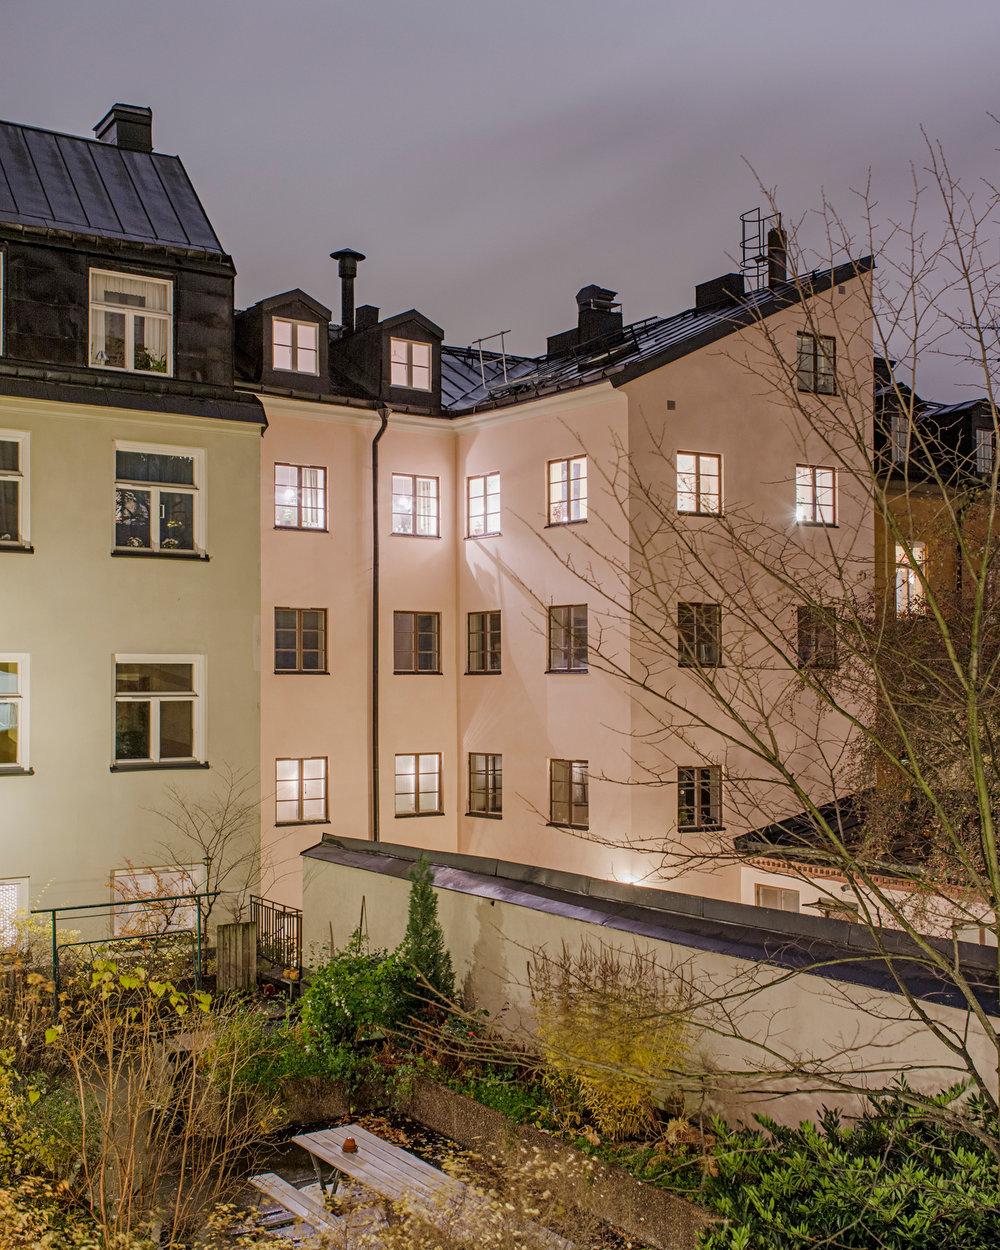 Stockholm #1